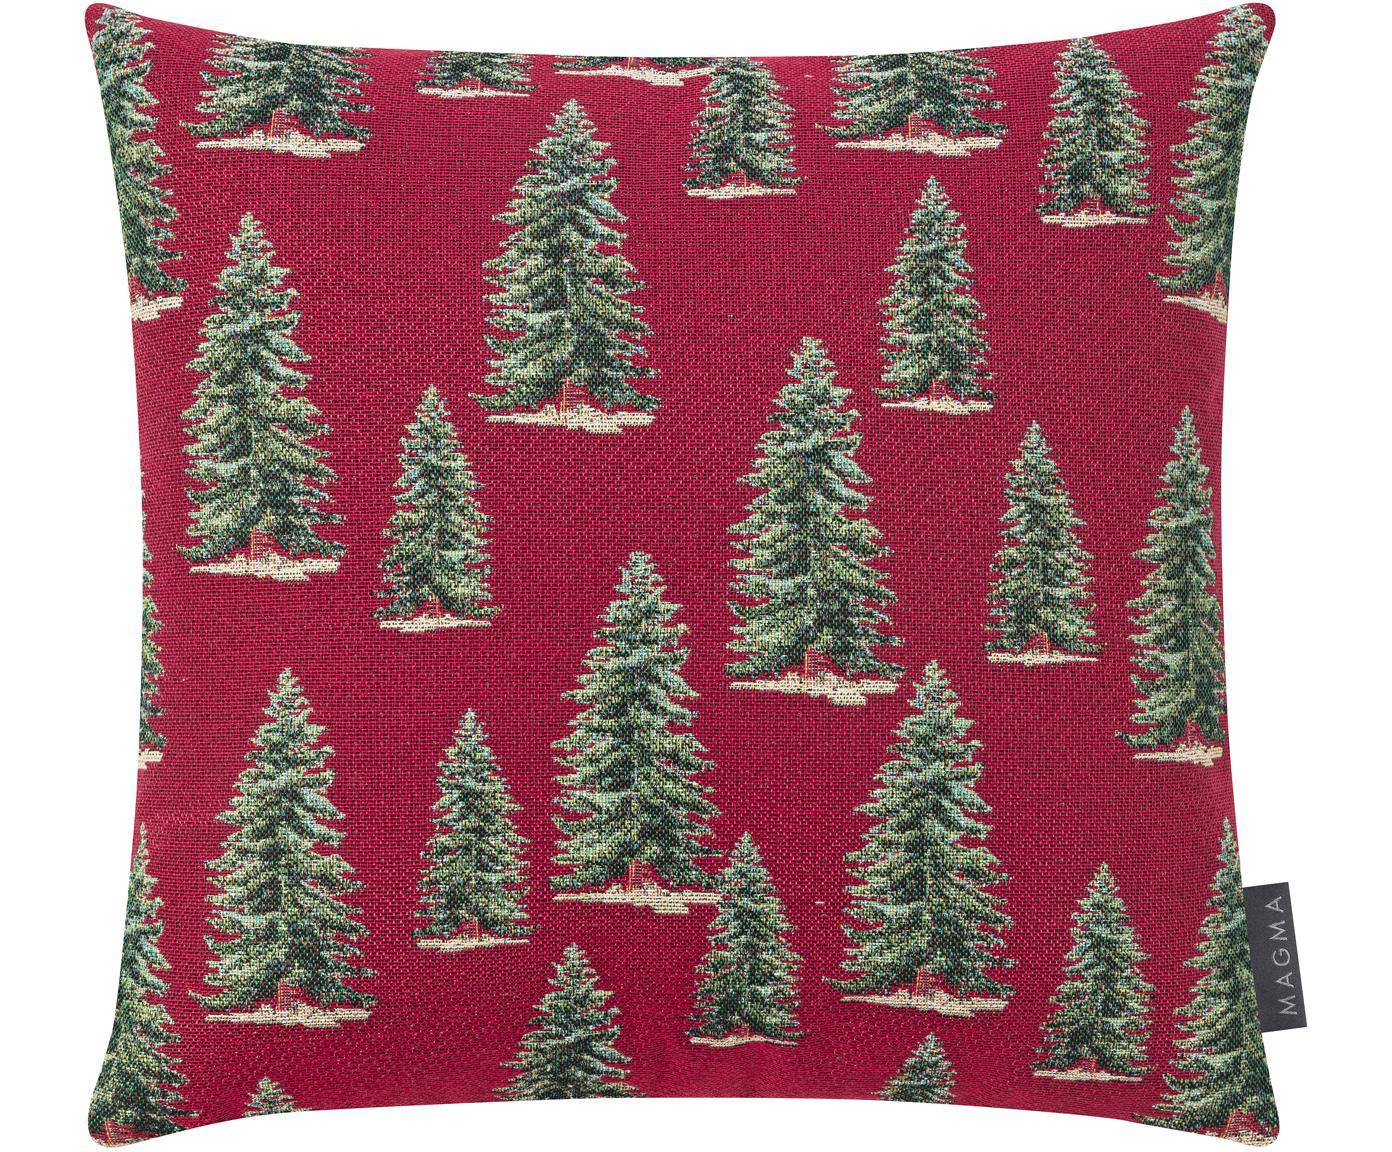 Kissenhülle Pinetree in Rot/Grün, Vorderseite: 55%Polyester, 45%Baumwo, Webart: Jacquard, Rückseite: Polyestersamt, Rot, Grün, Beige, 40 x 40 cm